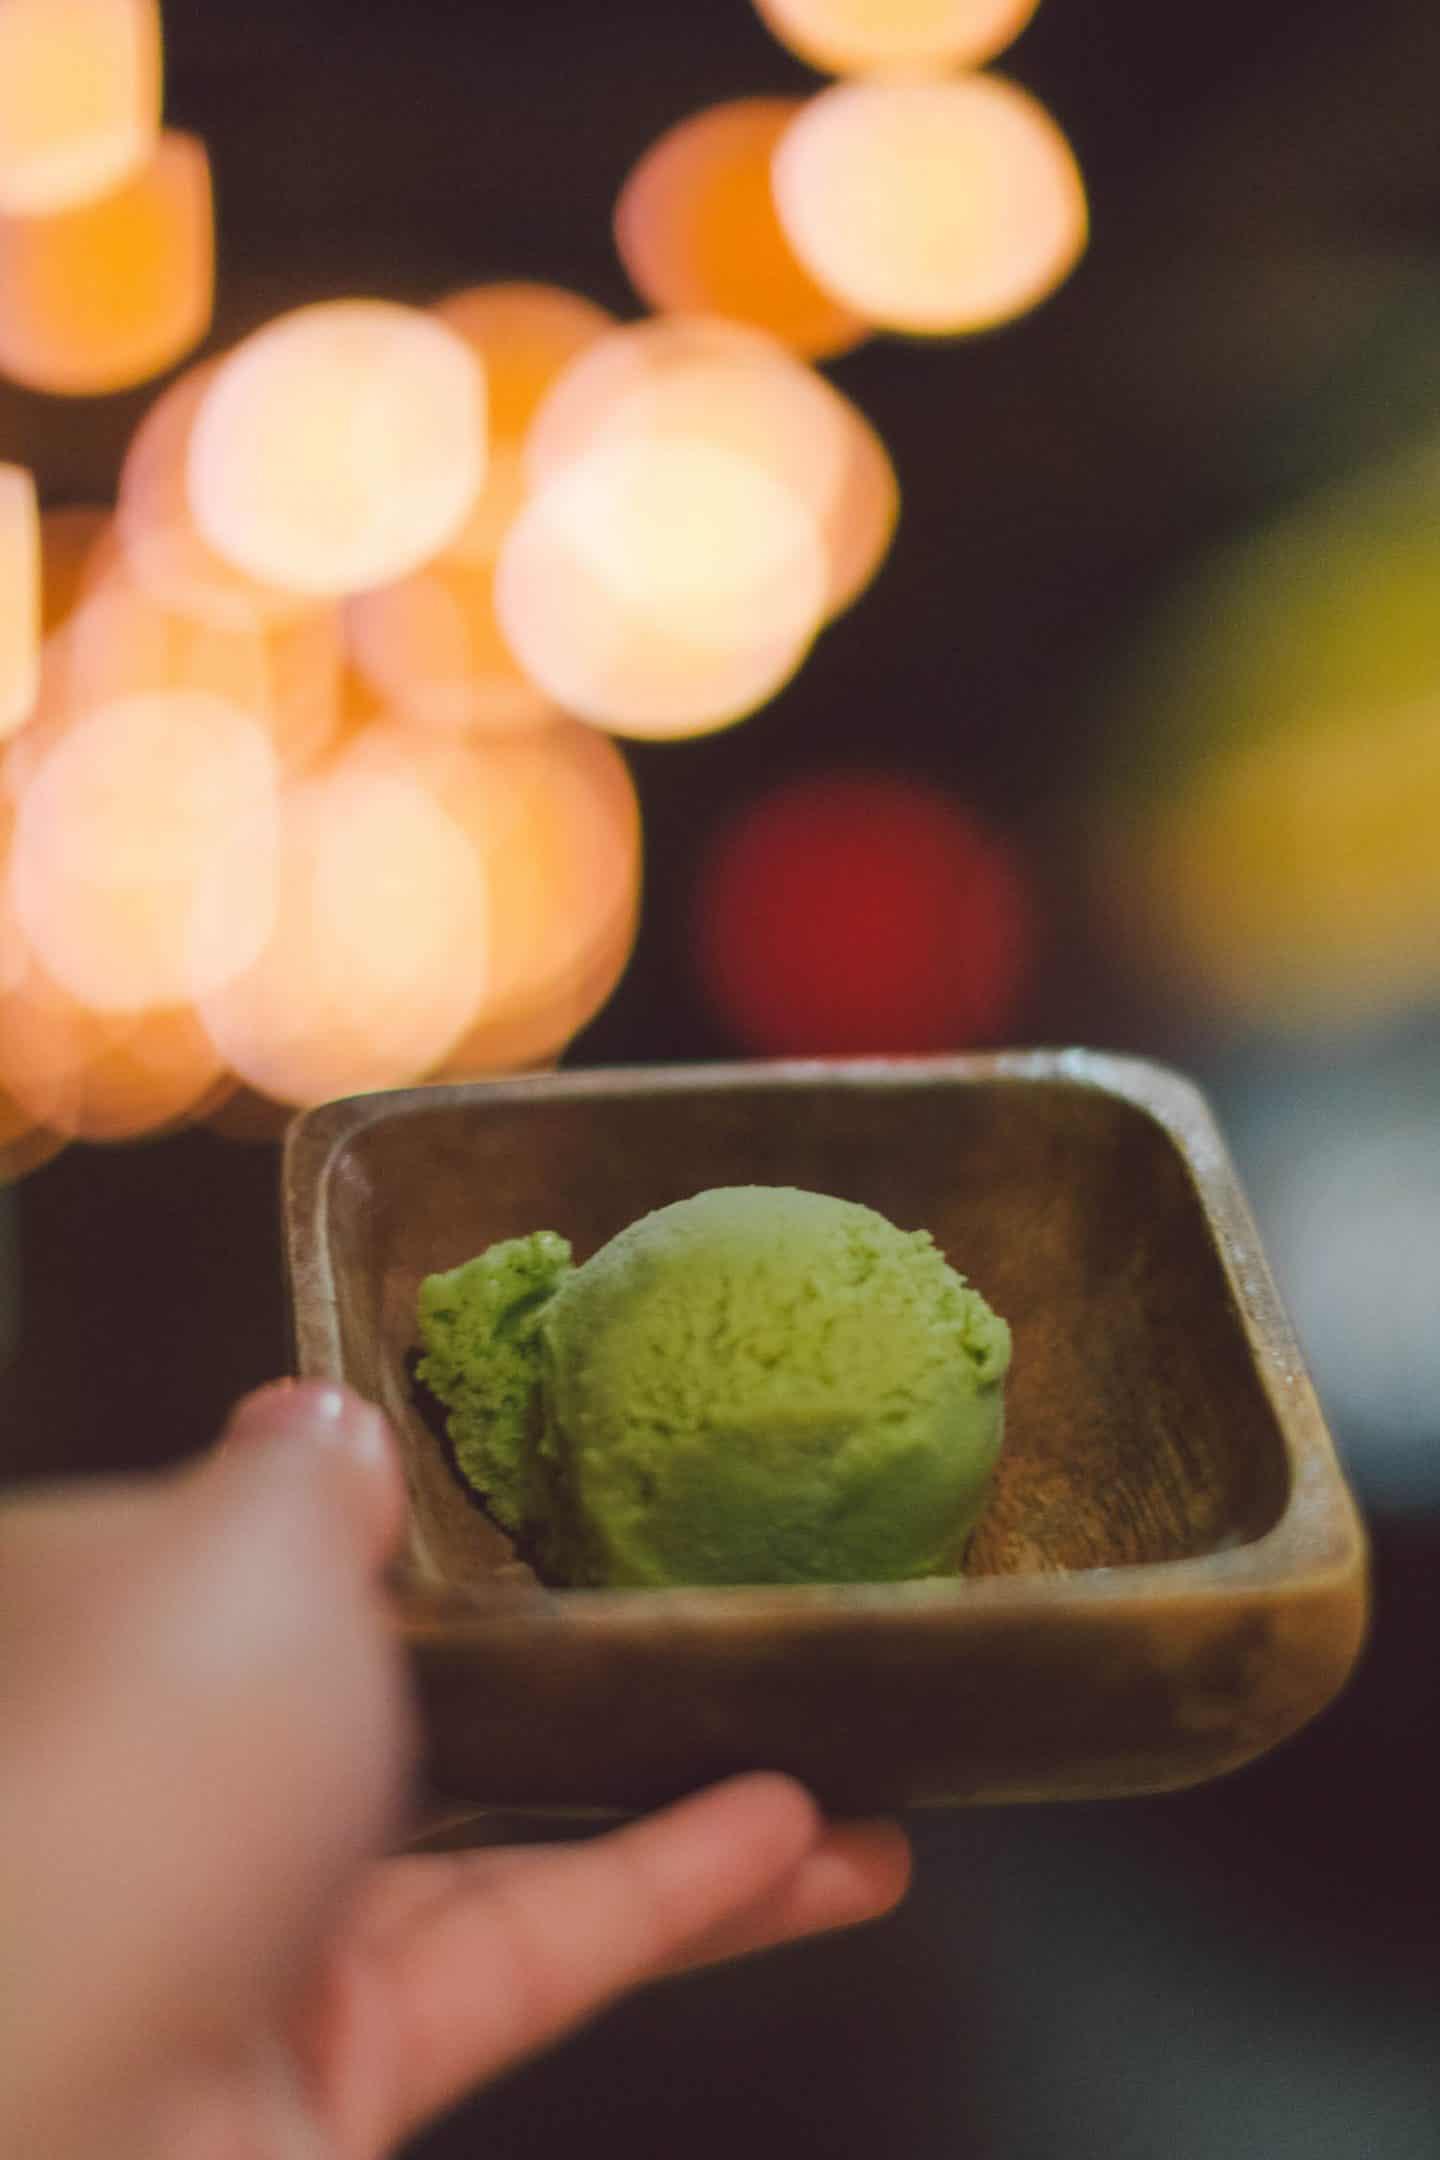 Matcha ice cream at Kinka Izakaya in Toronto